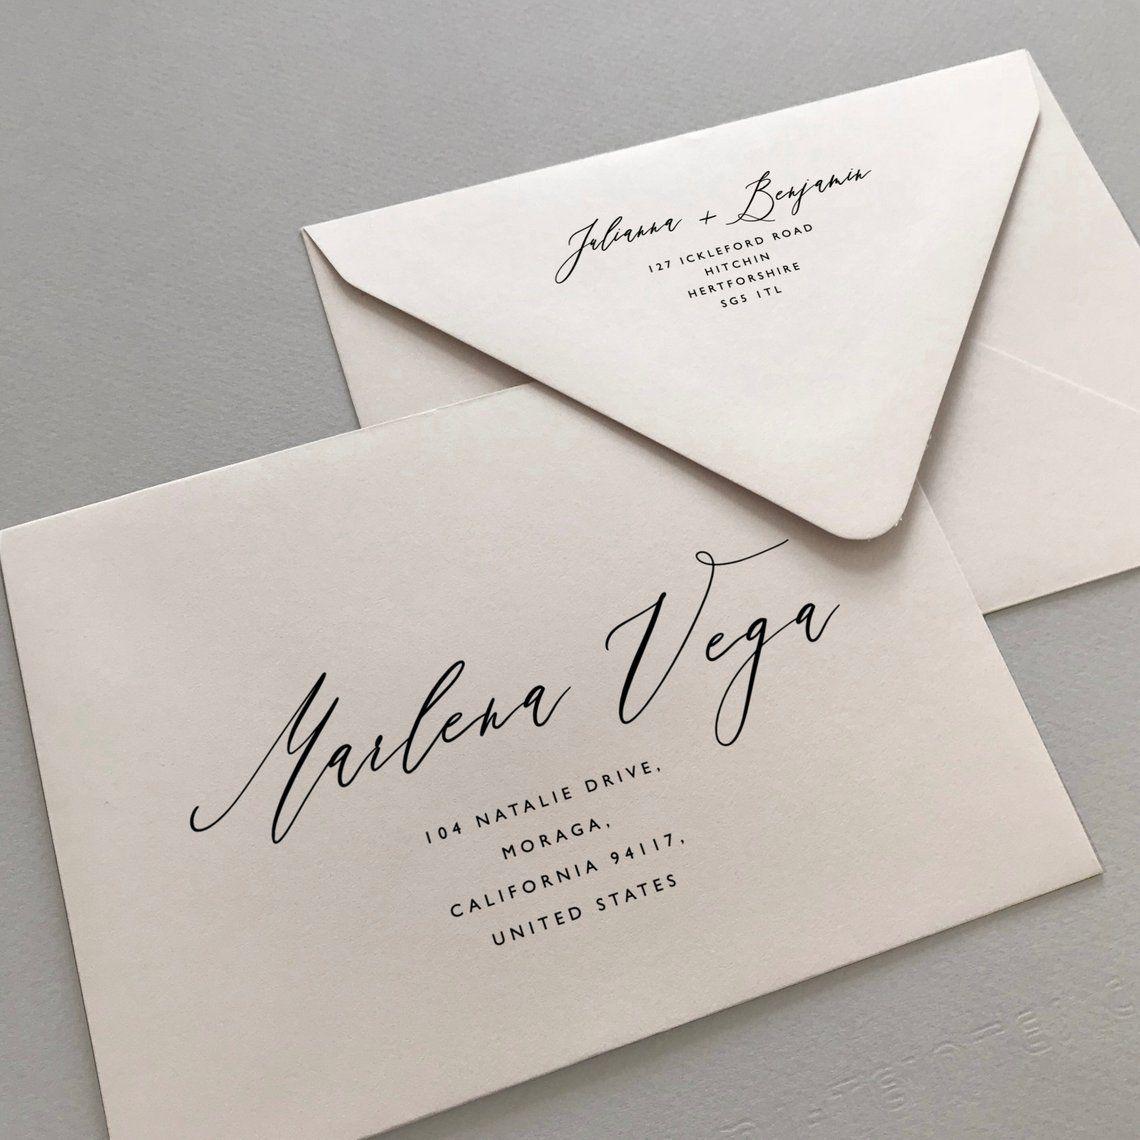 Image 0 Envelope Addressing Template Wedding Invitation Envelopes Addressing Envelopes